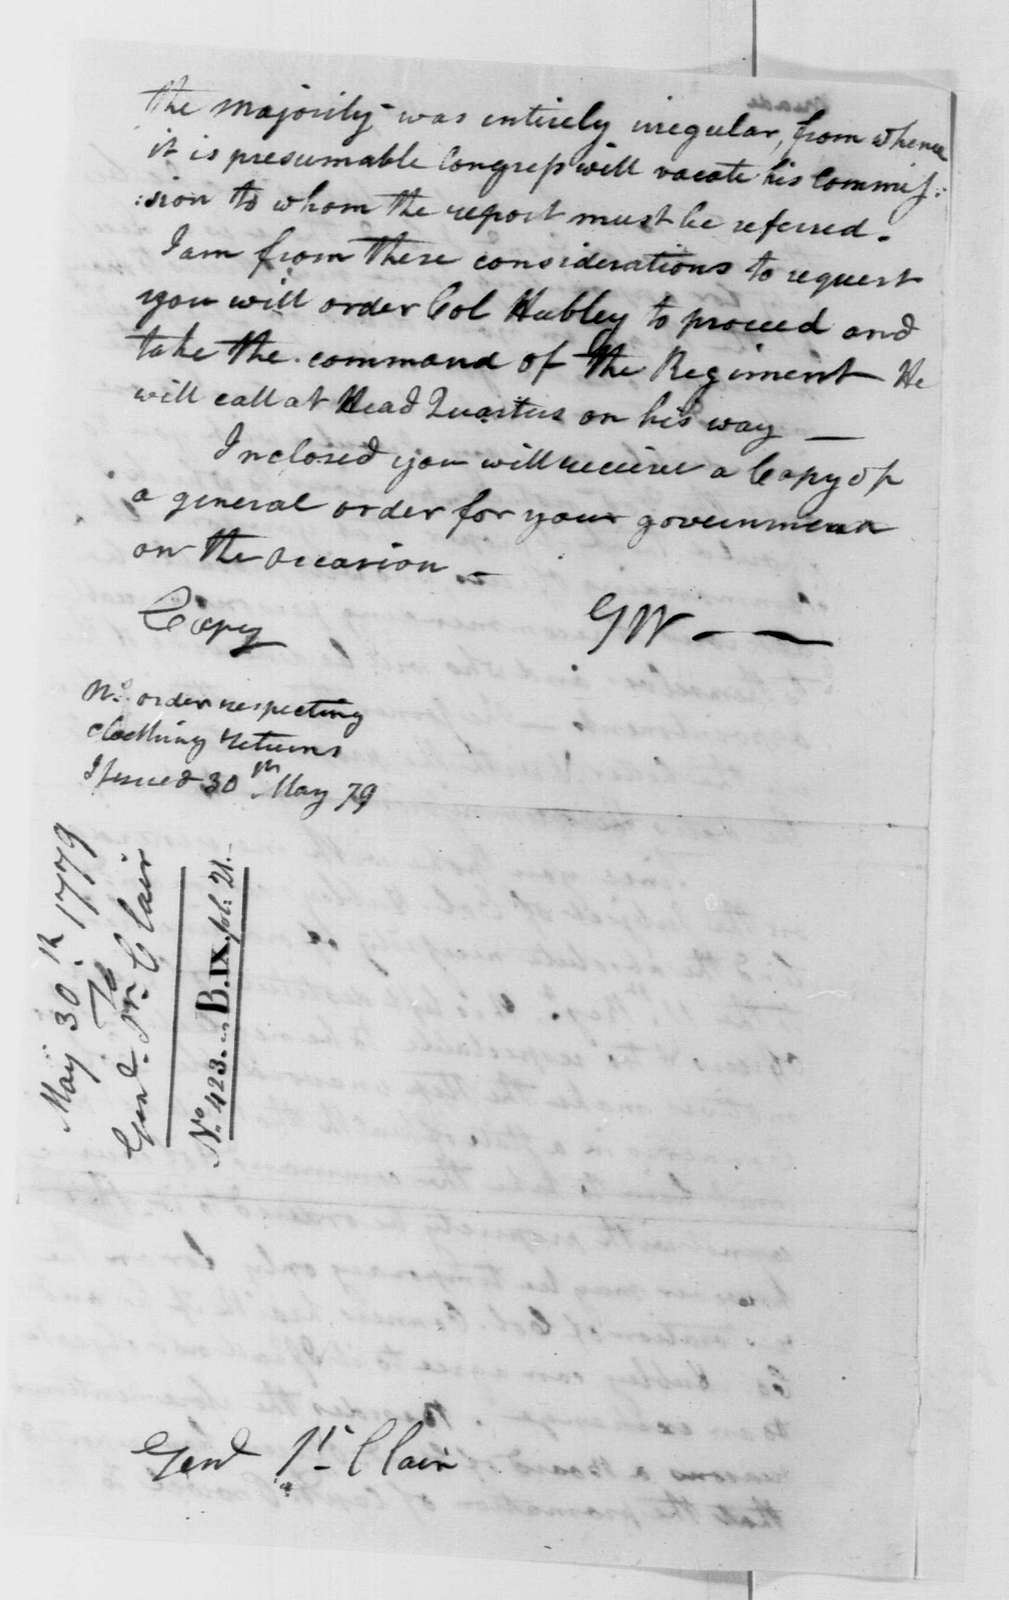 George Washington Papers, Series 4, General Correspondence: George Washington to Arthur St. Clair, May 30, 1779